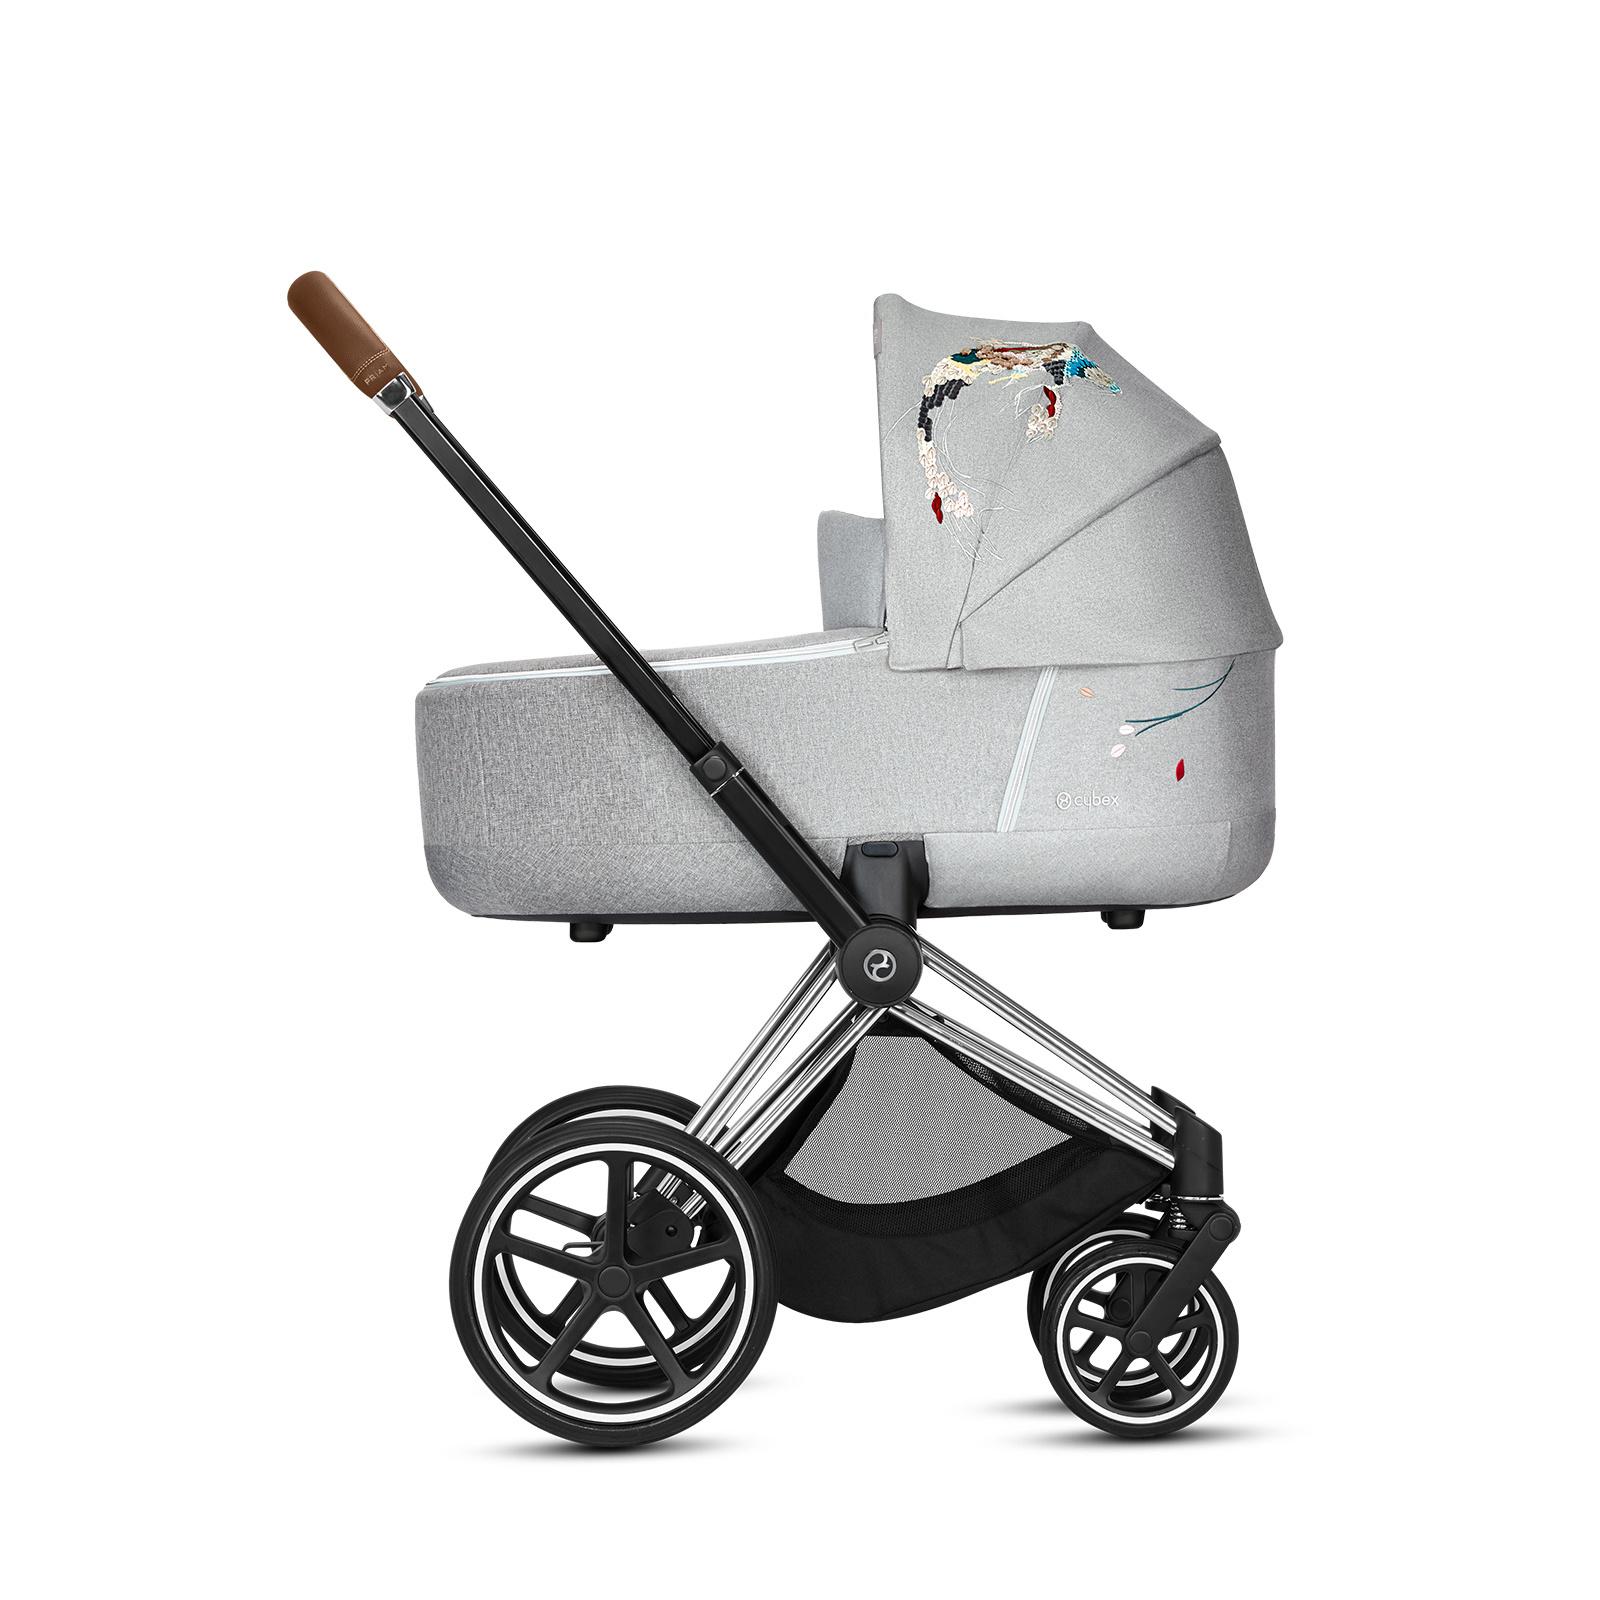 Kinderwagen Cybex Priam koi-2